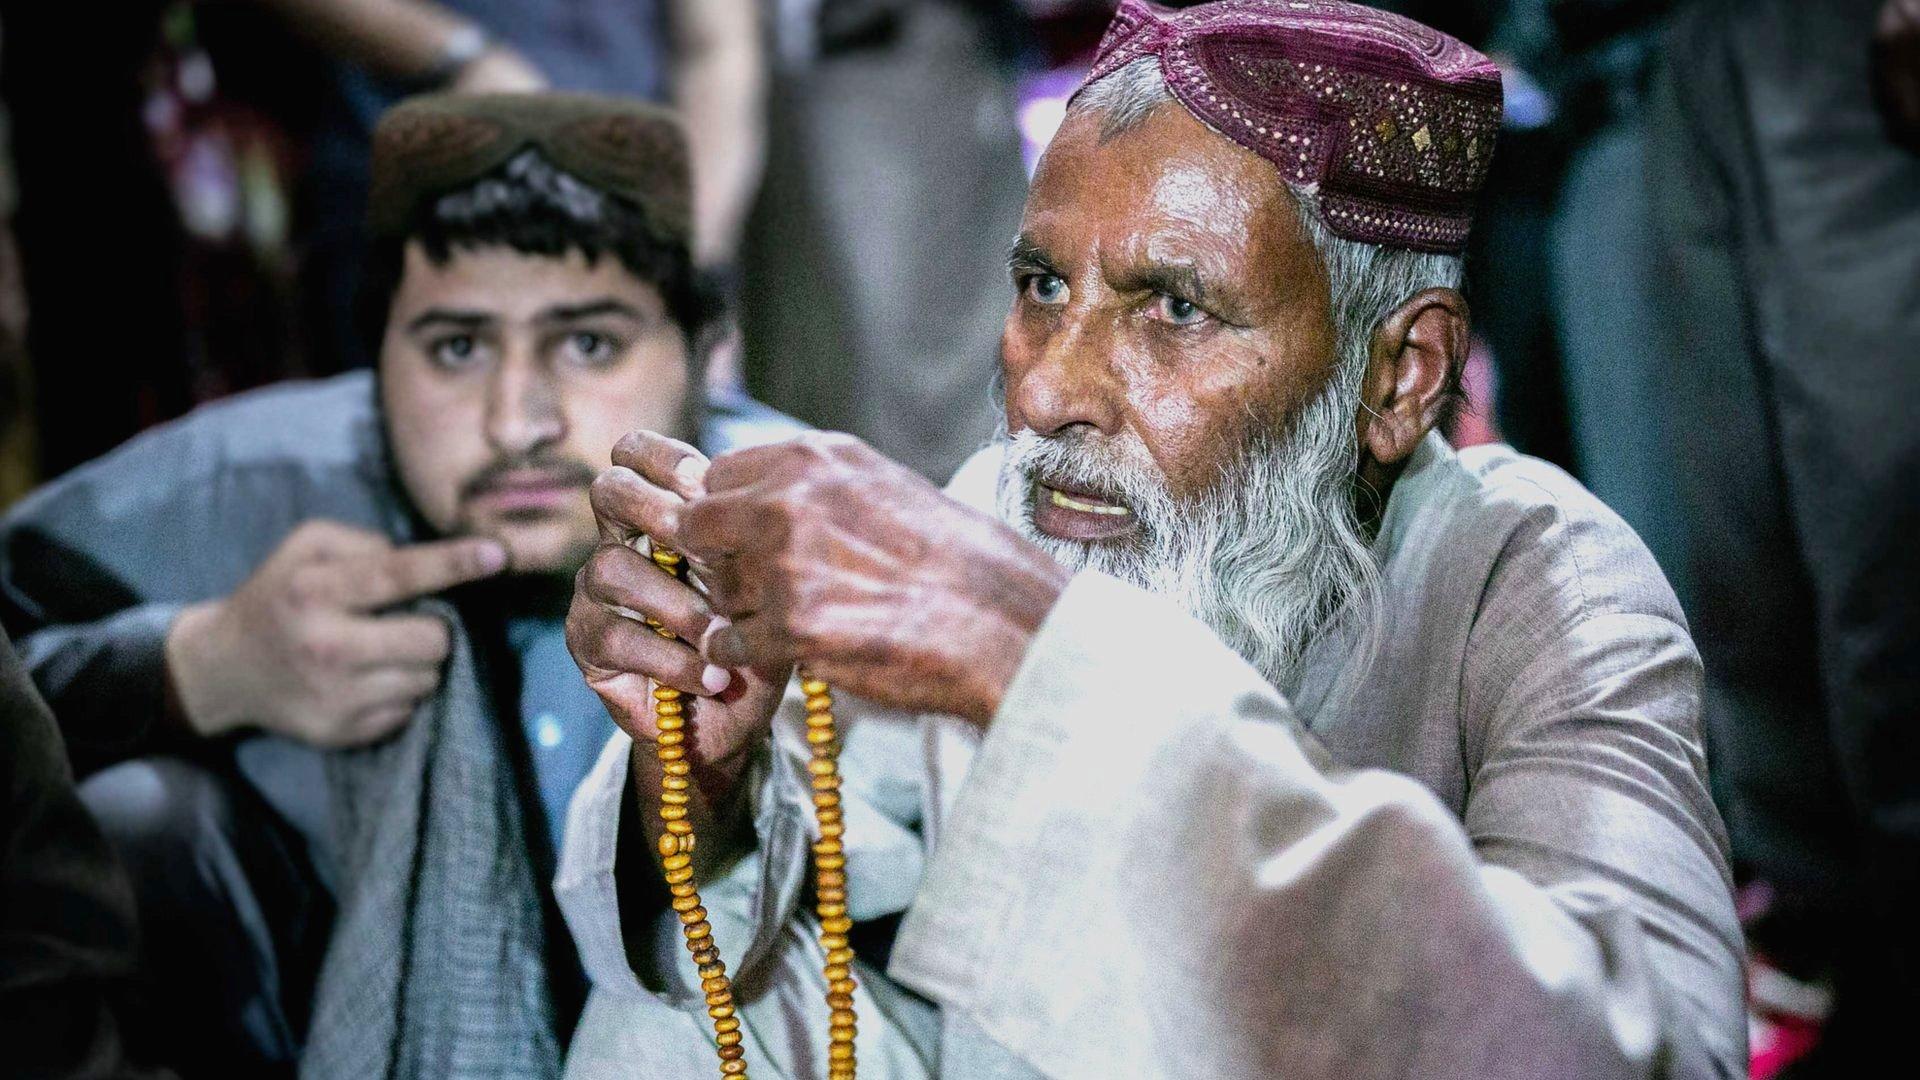 Elderly Talib prisoner in Pul-e-Charkhi prison, Afghanistan